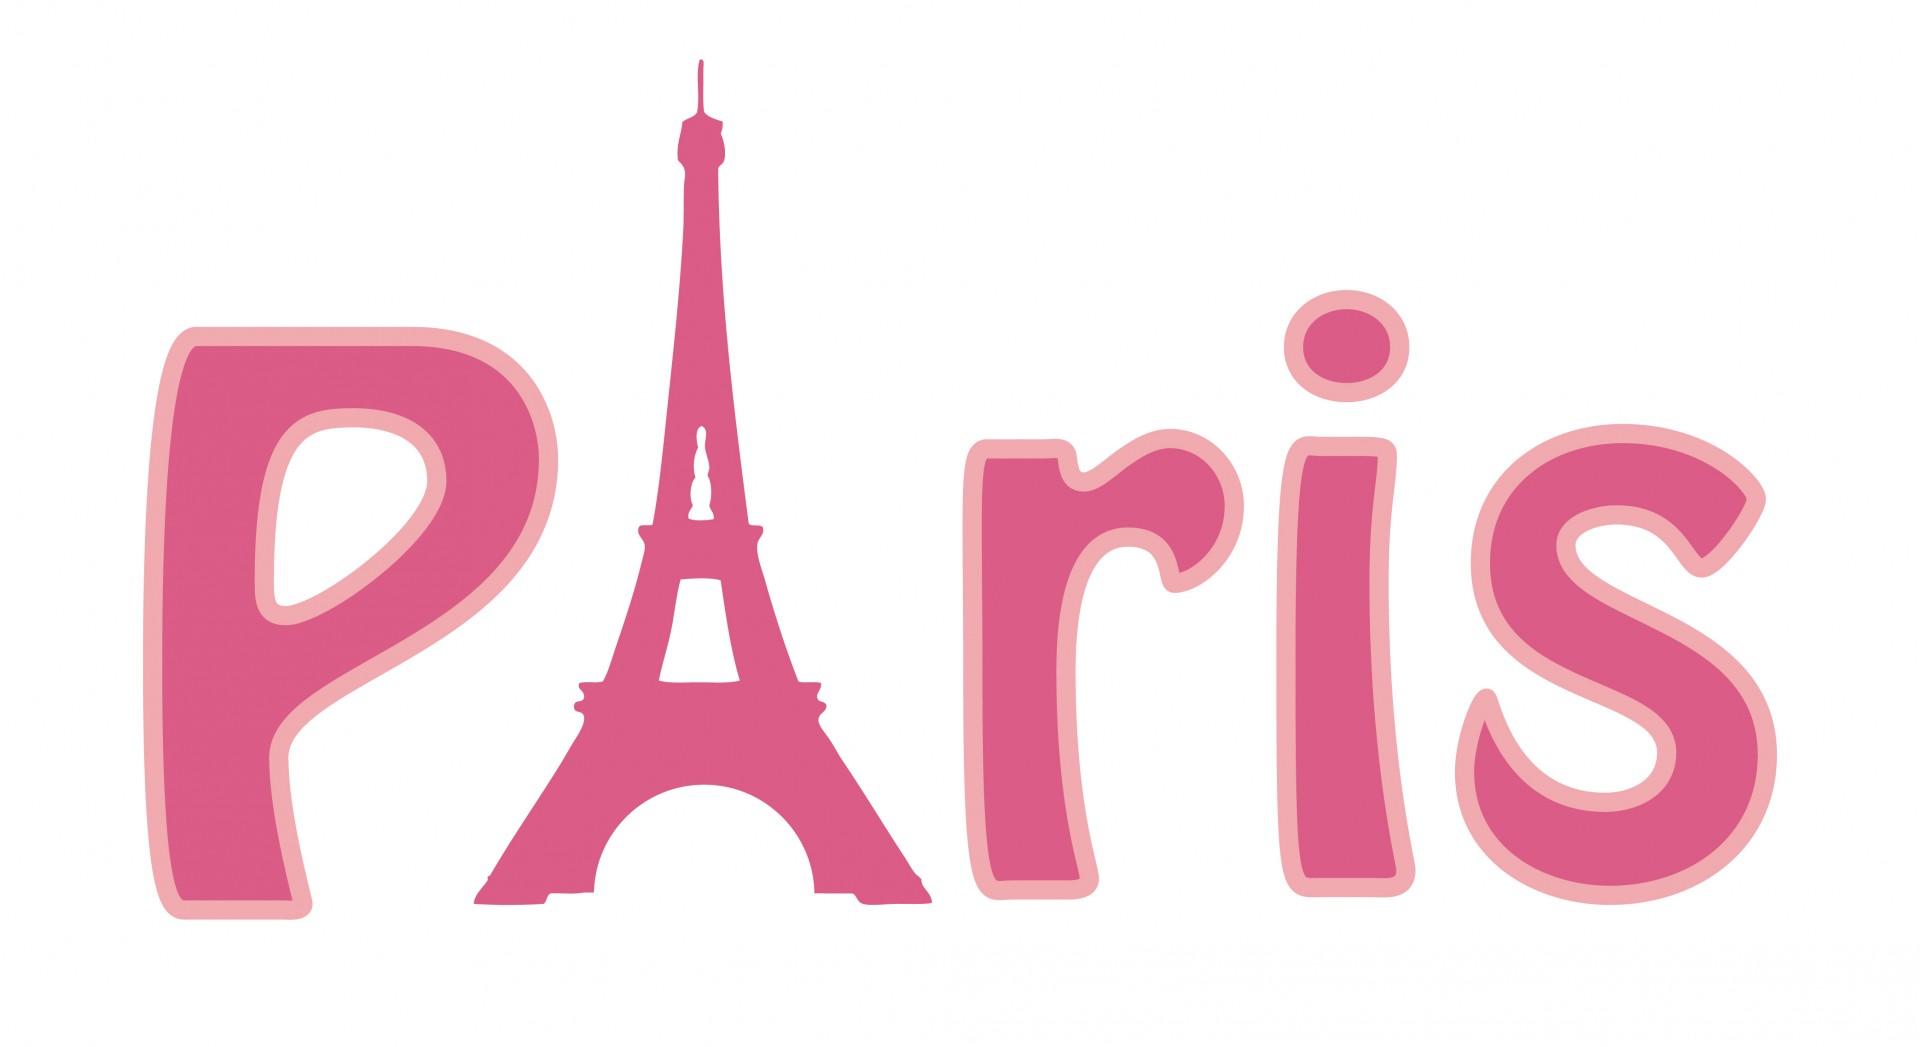 Eiffel Tower Paris Clipart-Eiffel Tower Paris Clipart-2